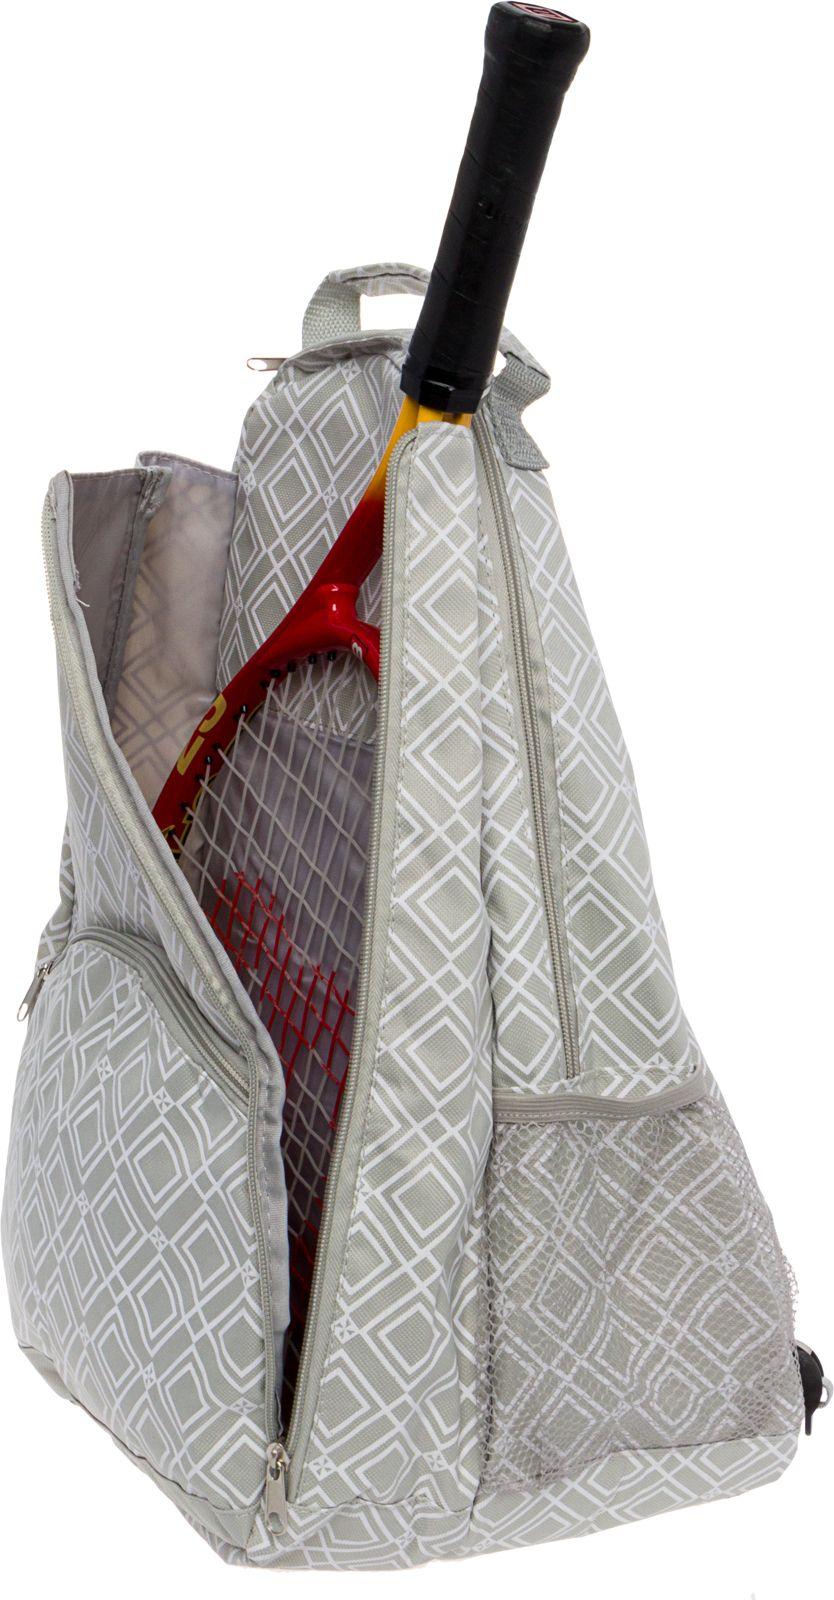 Finding The Comfortable Tennis Racquet Bag In 2020 Tennis Racket Pro Tennis Racquet Bag Tennis Racquet Racquet Bag